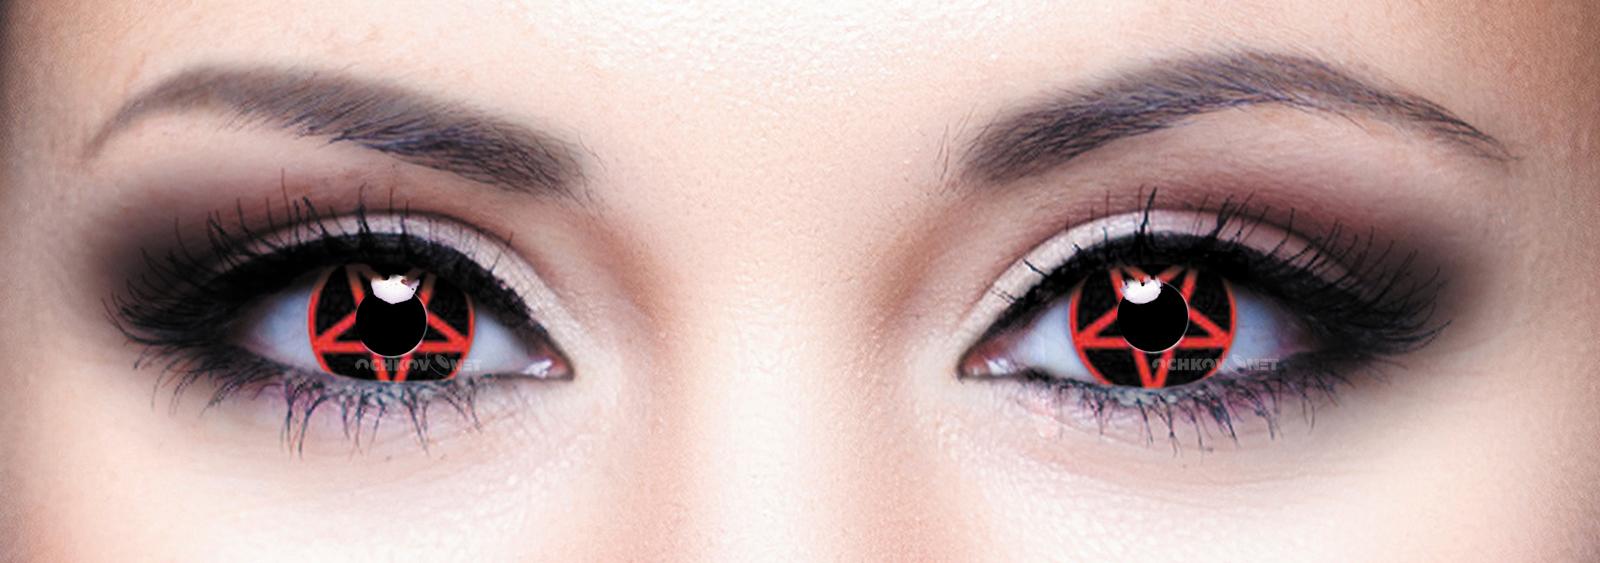 Контактные линзы Eye Free Colors 107 Пентаграмма 2 линзы